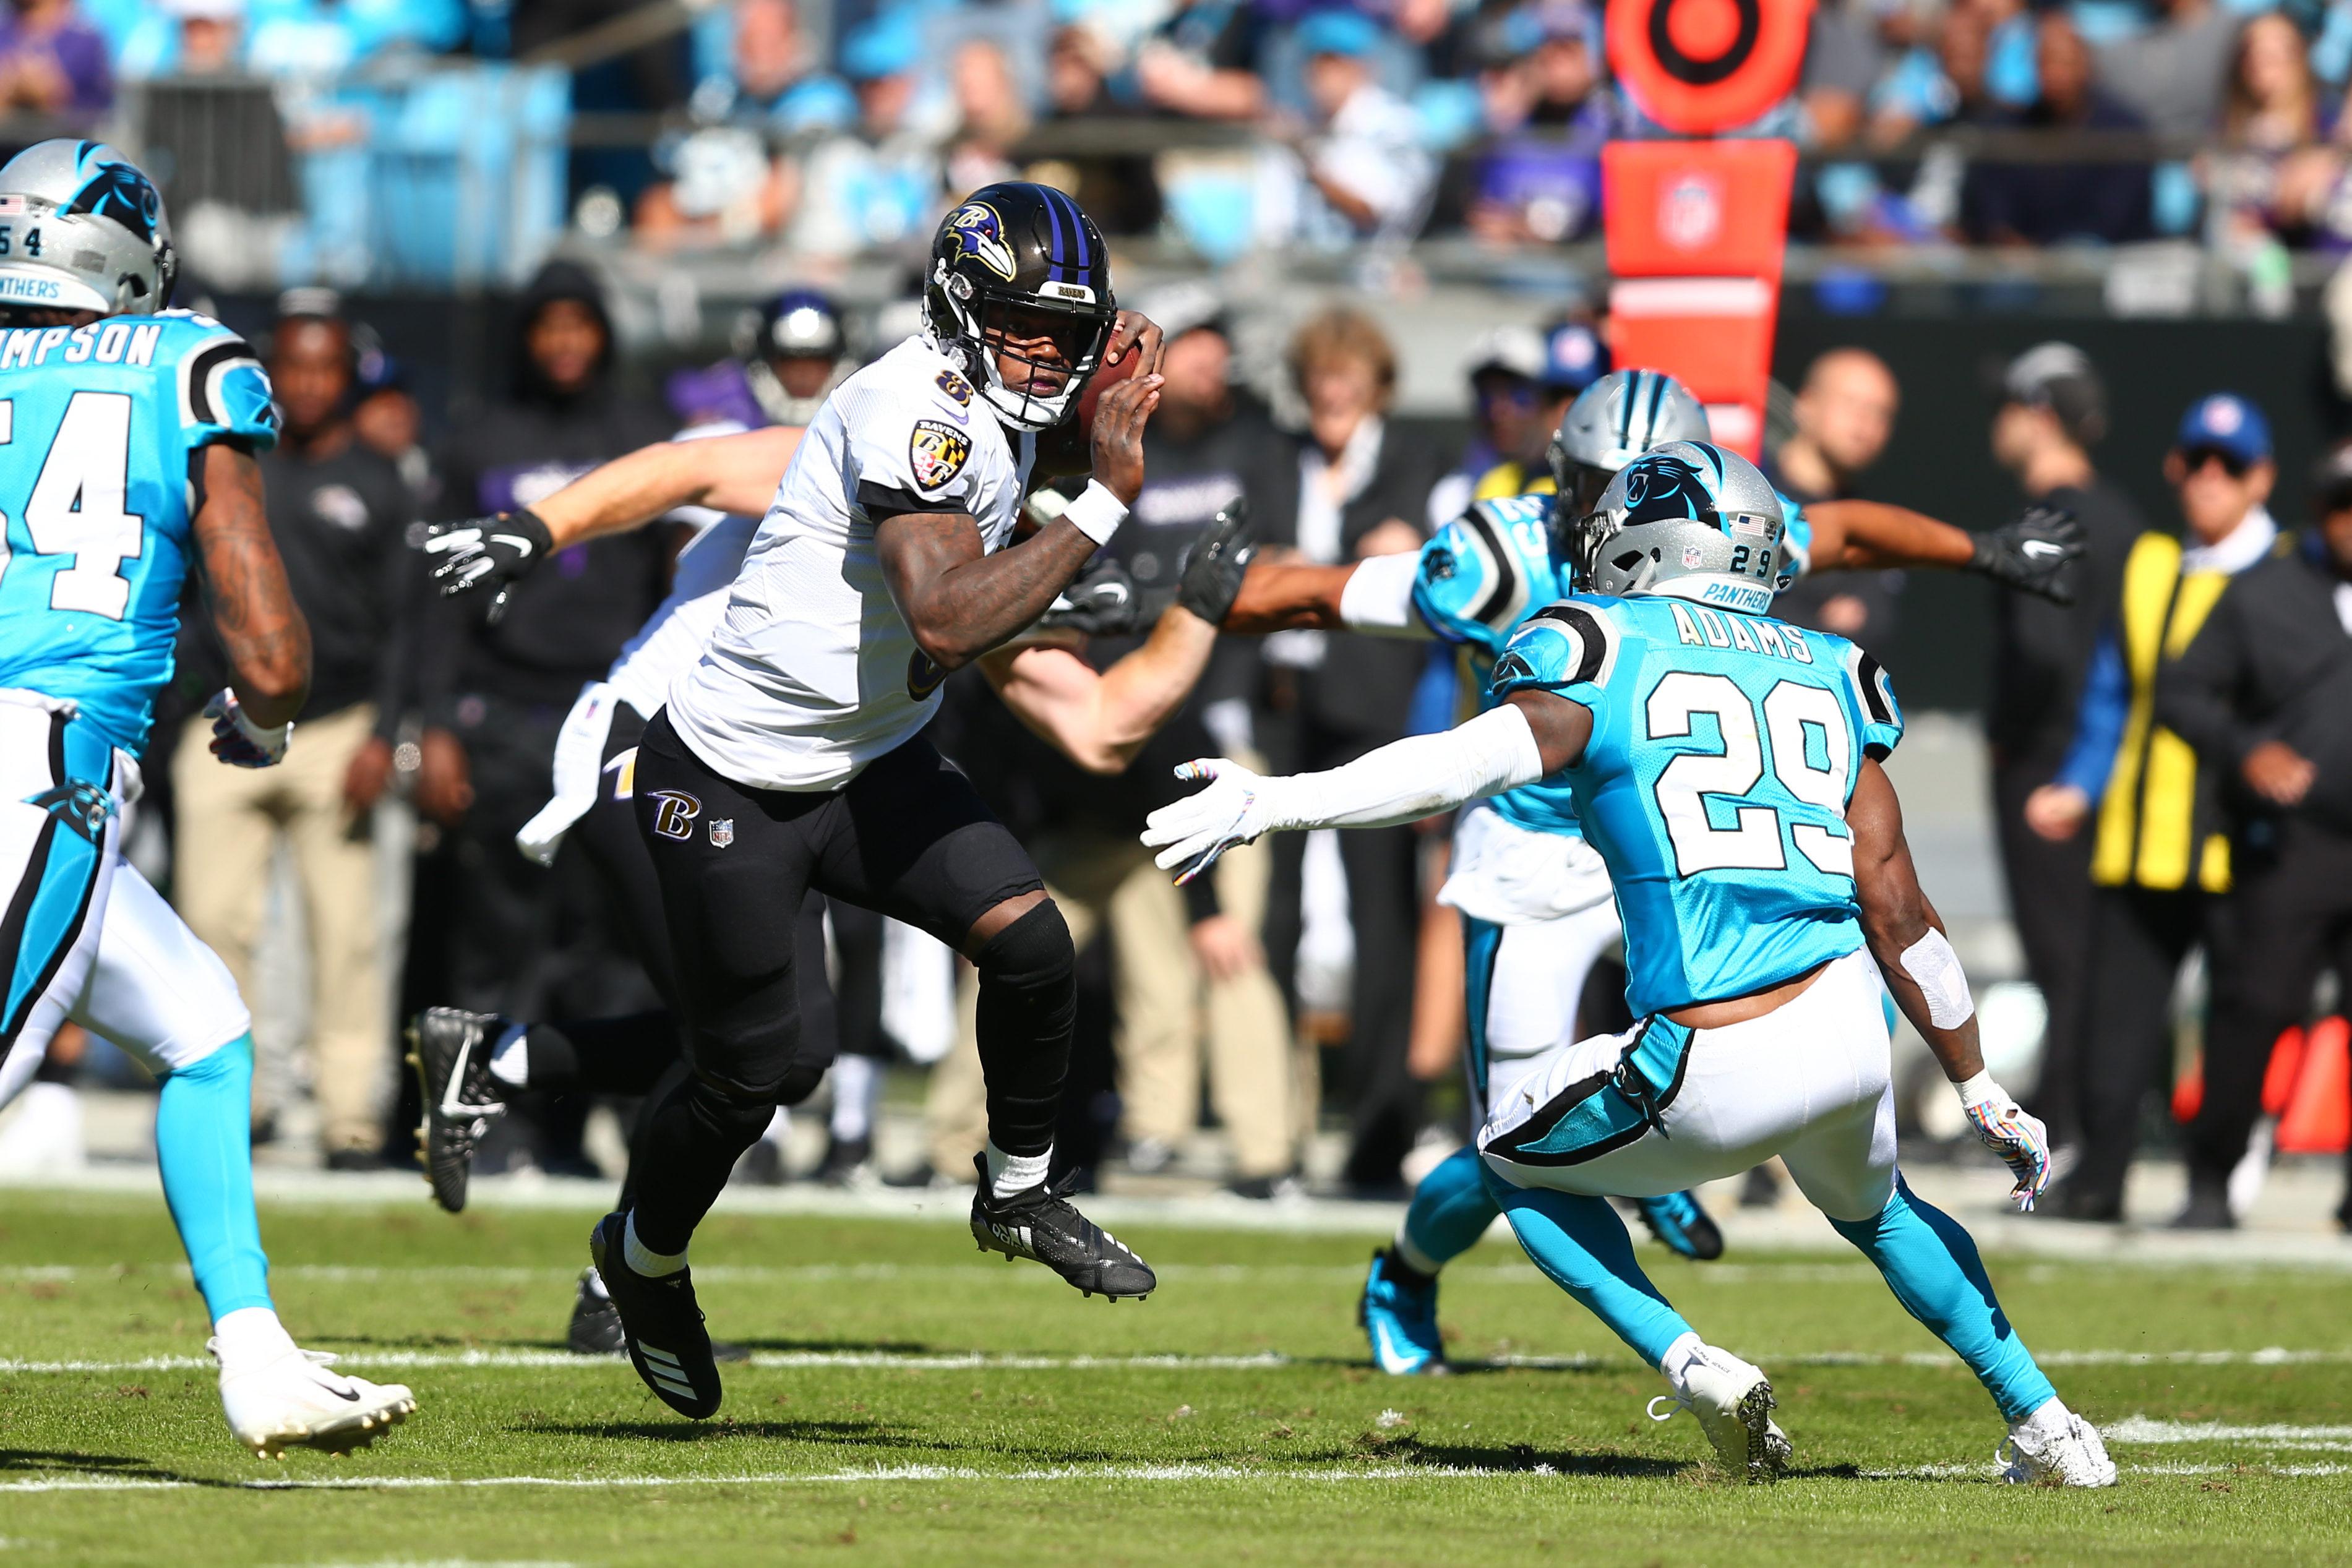 Tyler Huntley understudies Lamar in Ravens 20-3 win over Panthers